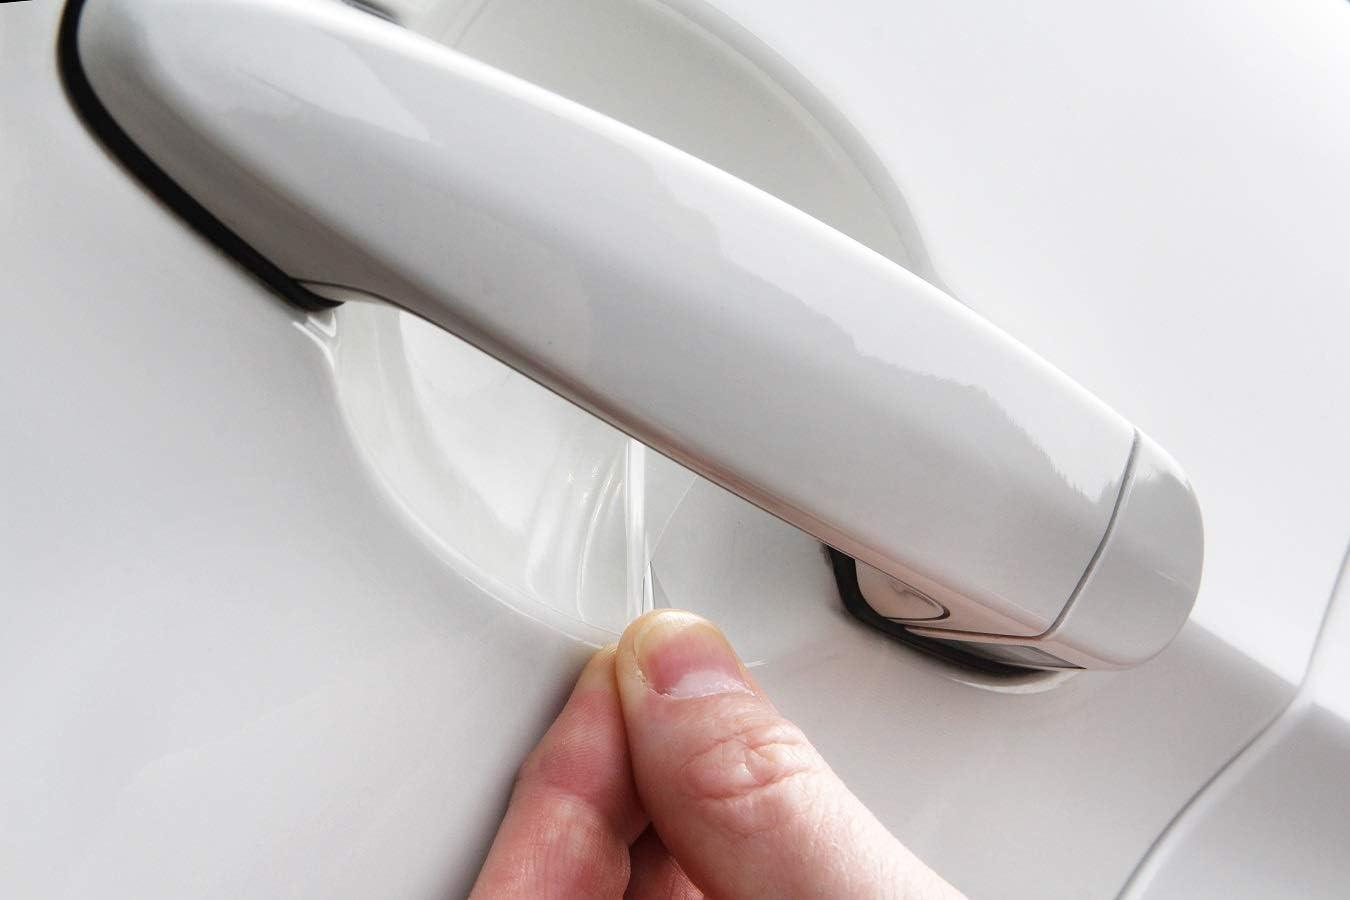 Lamin-x LN1518 Door Handle Cup Paint Protection